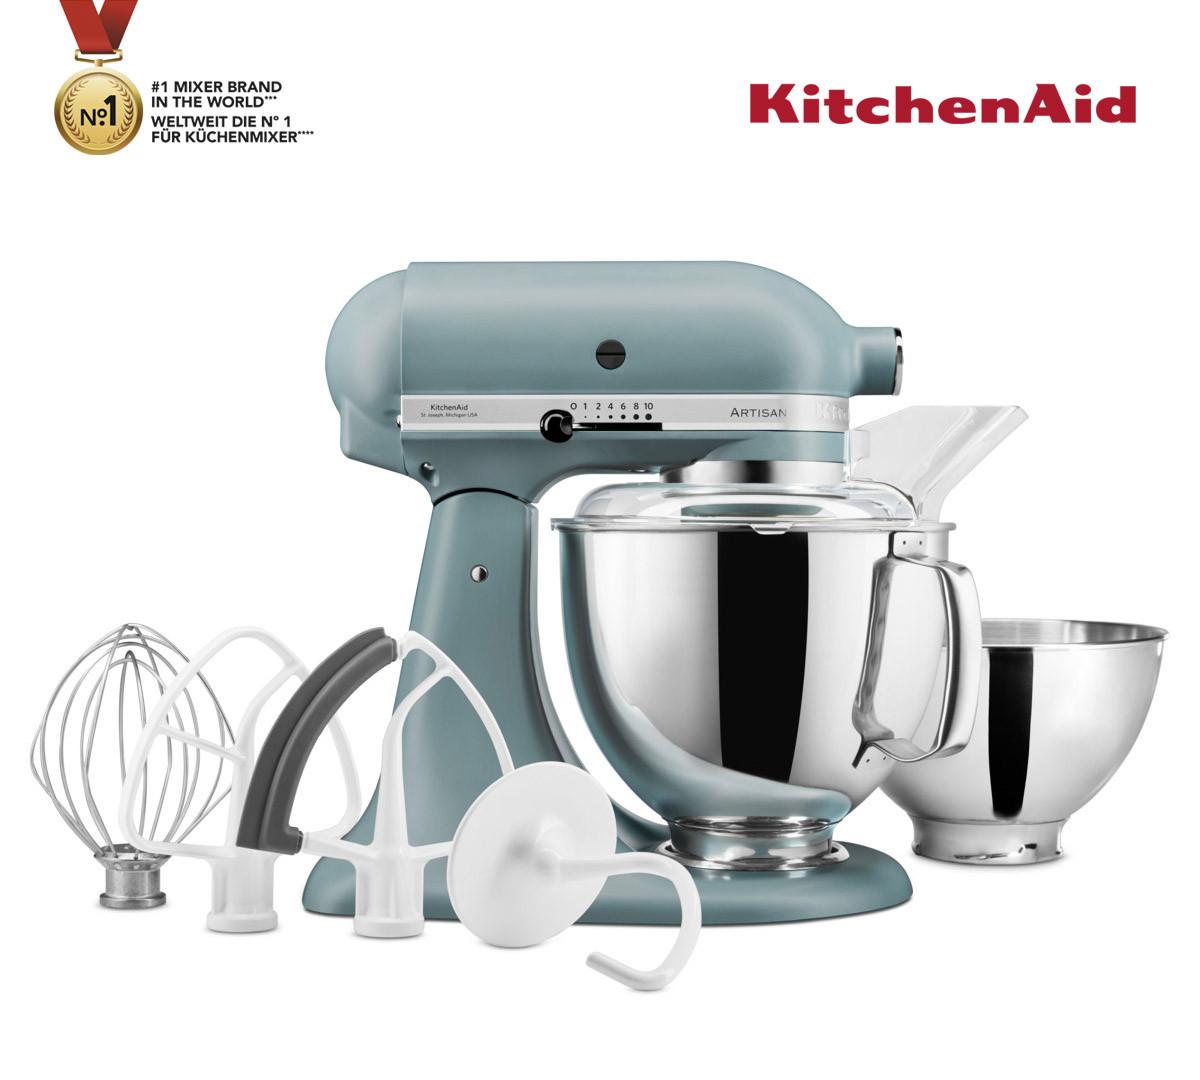 KitchenAid Küchenmaschine 175PS Entsafter Vital-Set nebelblau